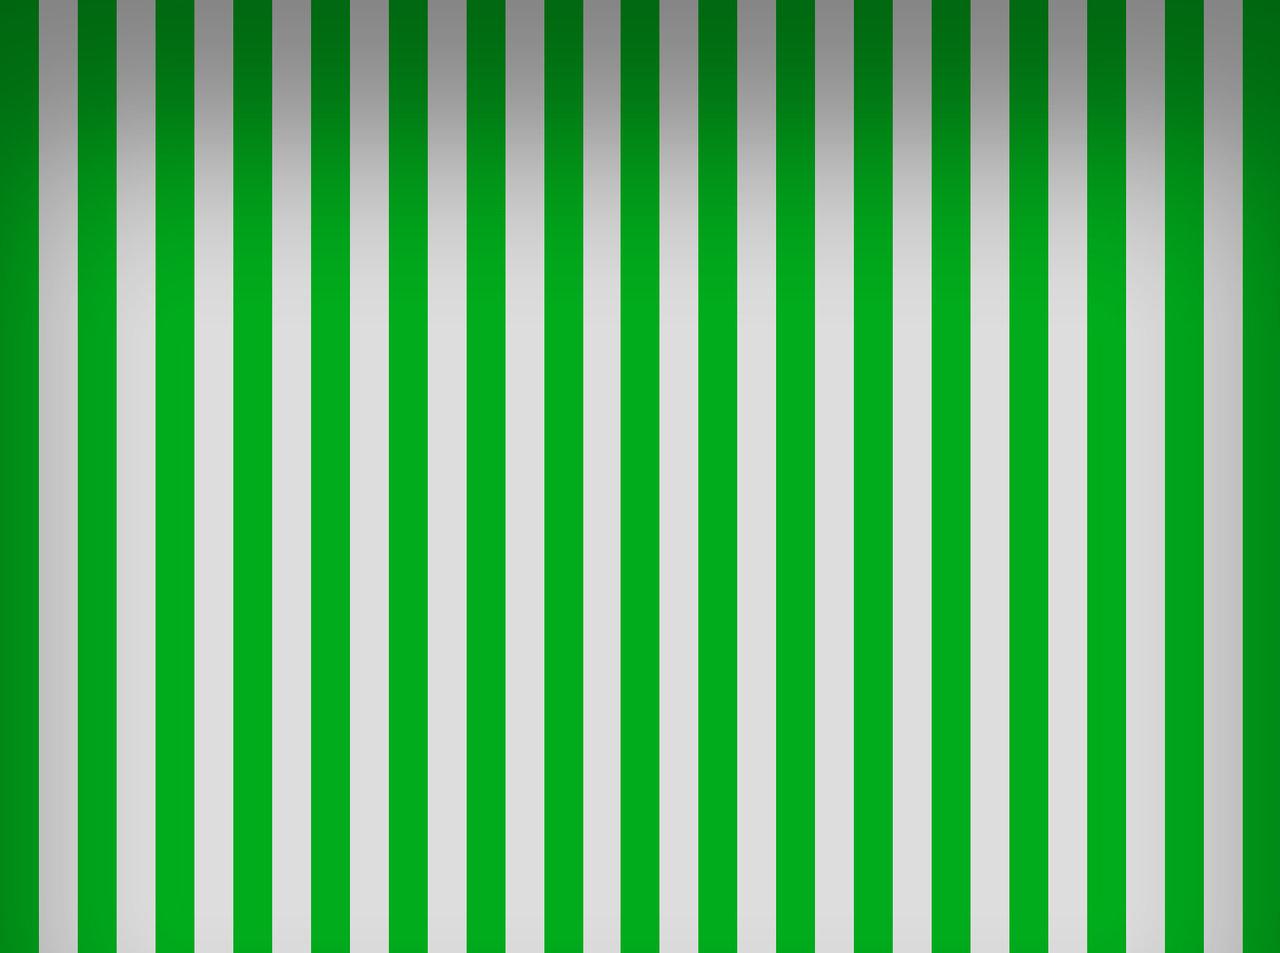 green white striped wallpaper by itslippiagain customization wallpaper 1280x953